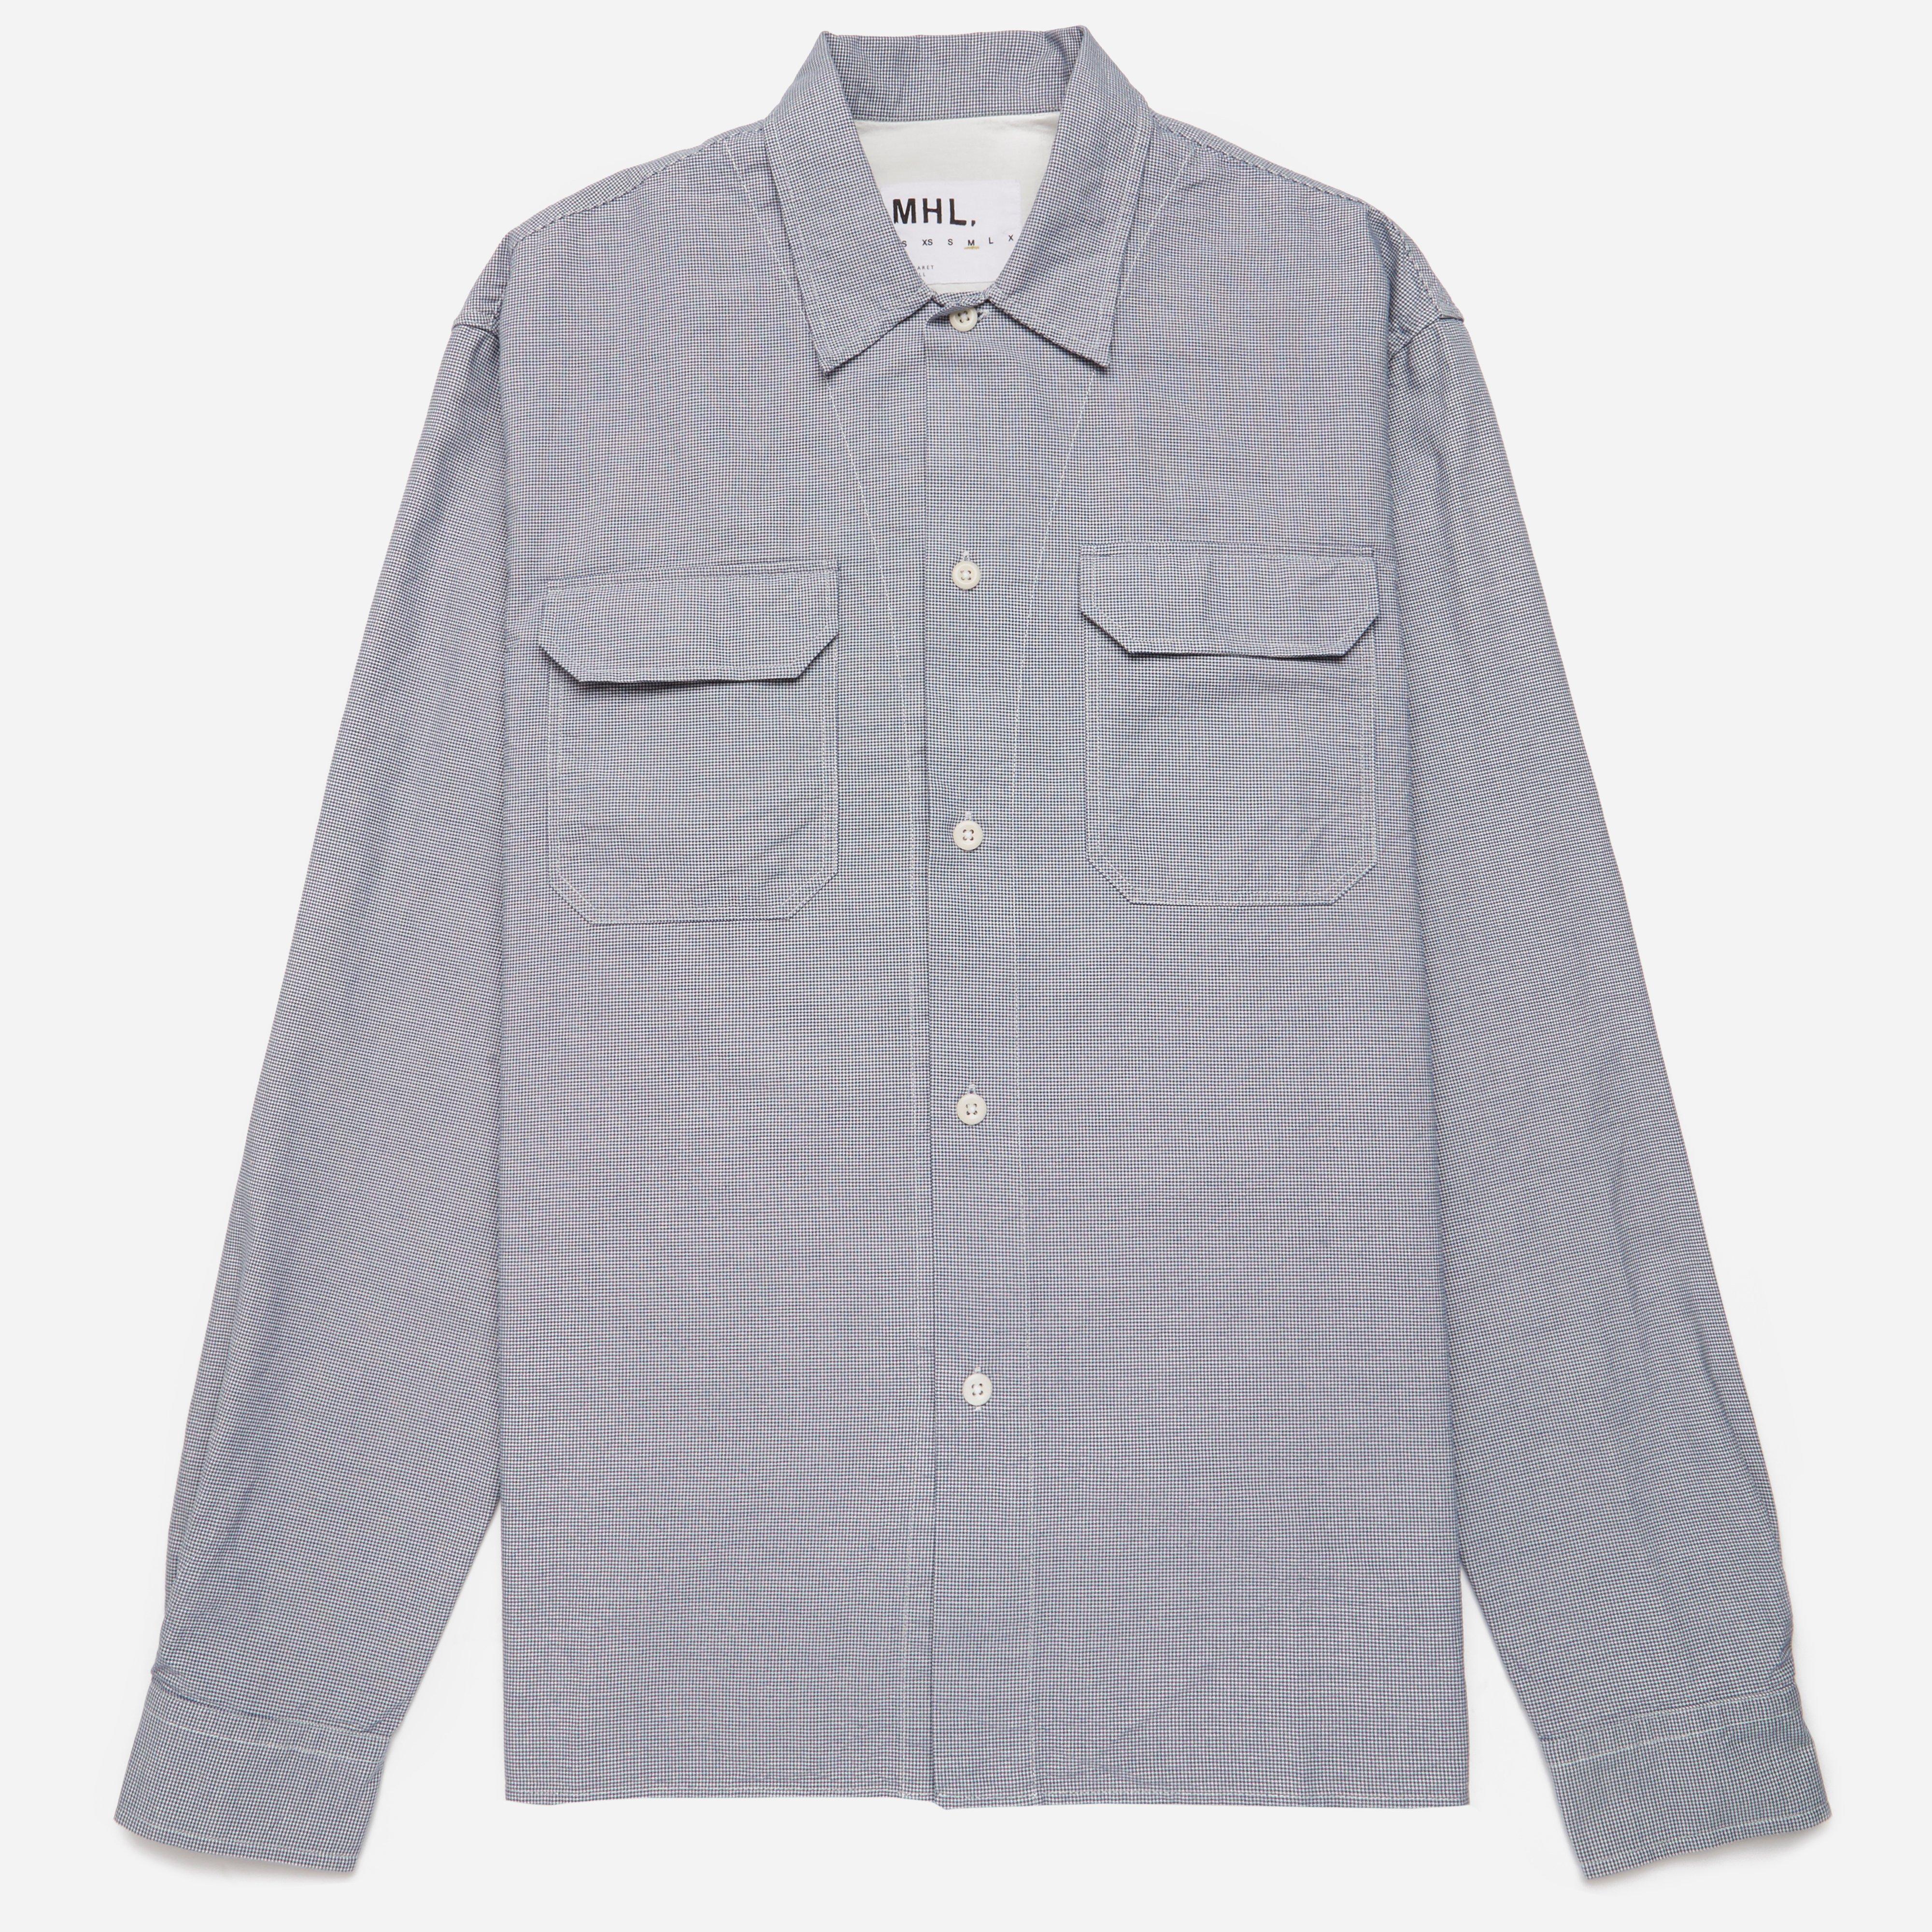 MHL Micro Puppytooth Cotton Rever Collar Shirt